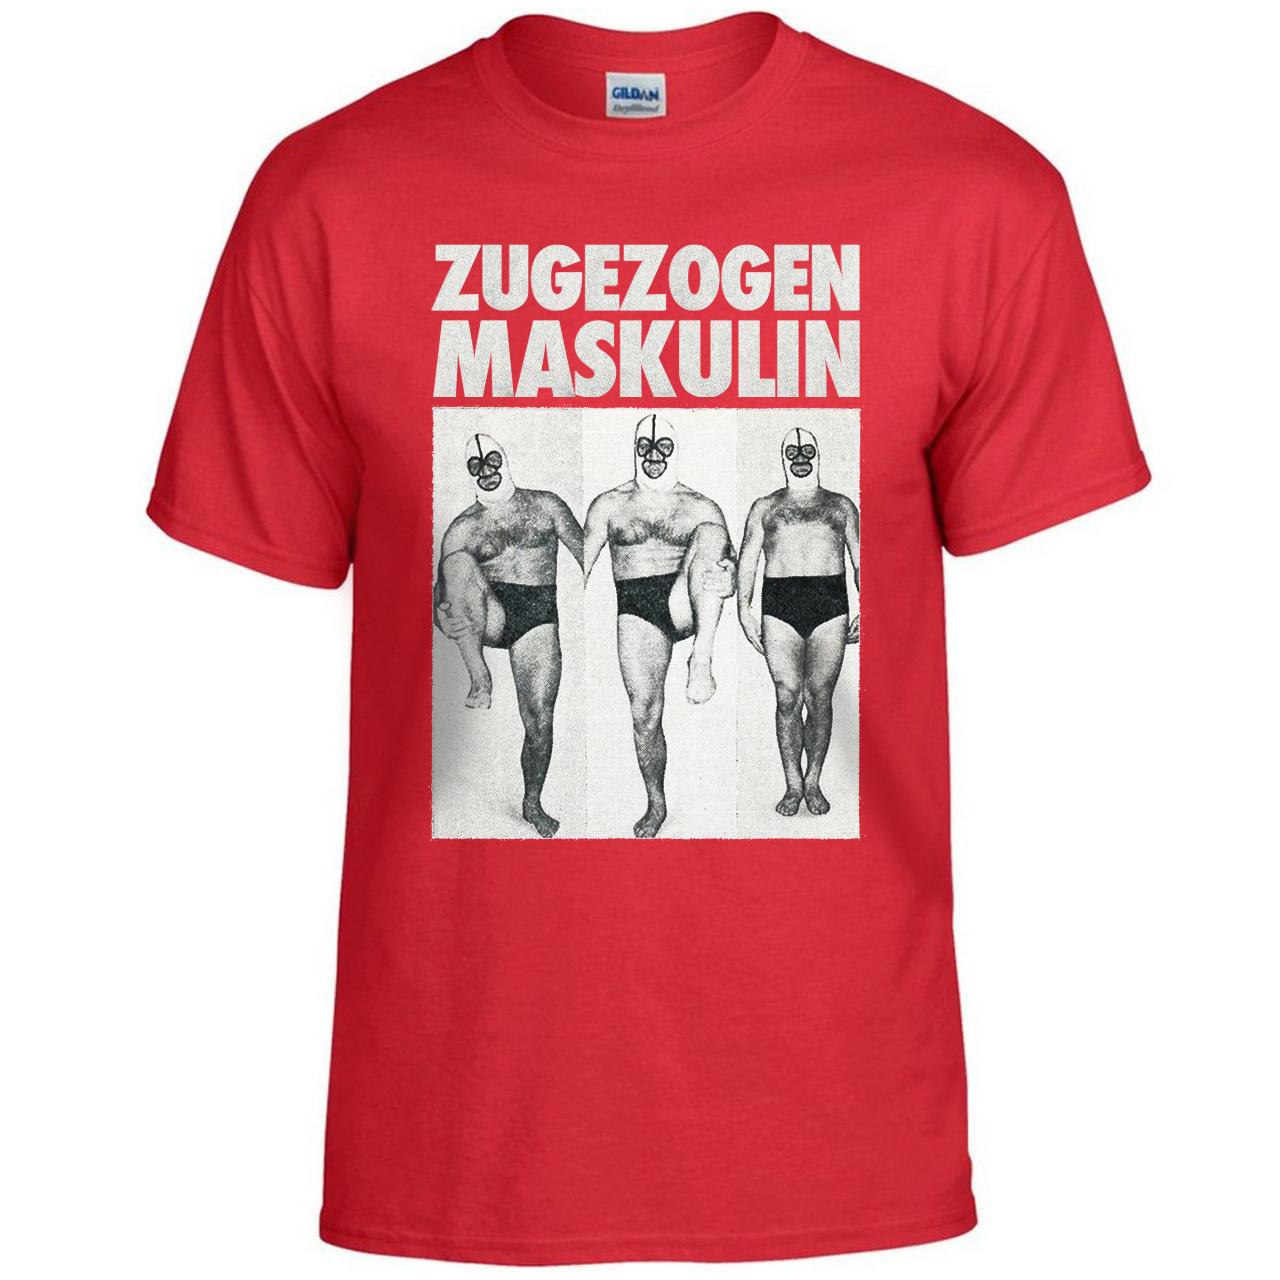 Zugezogen Maskulin ZM Aggro Wrestler / PREORDER BIS 27.11. T-Shirt, Rot